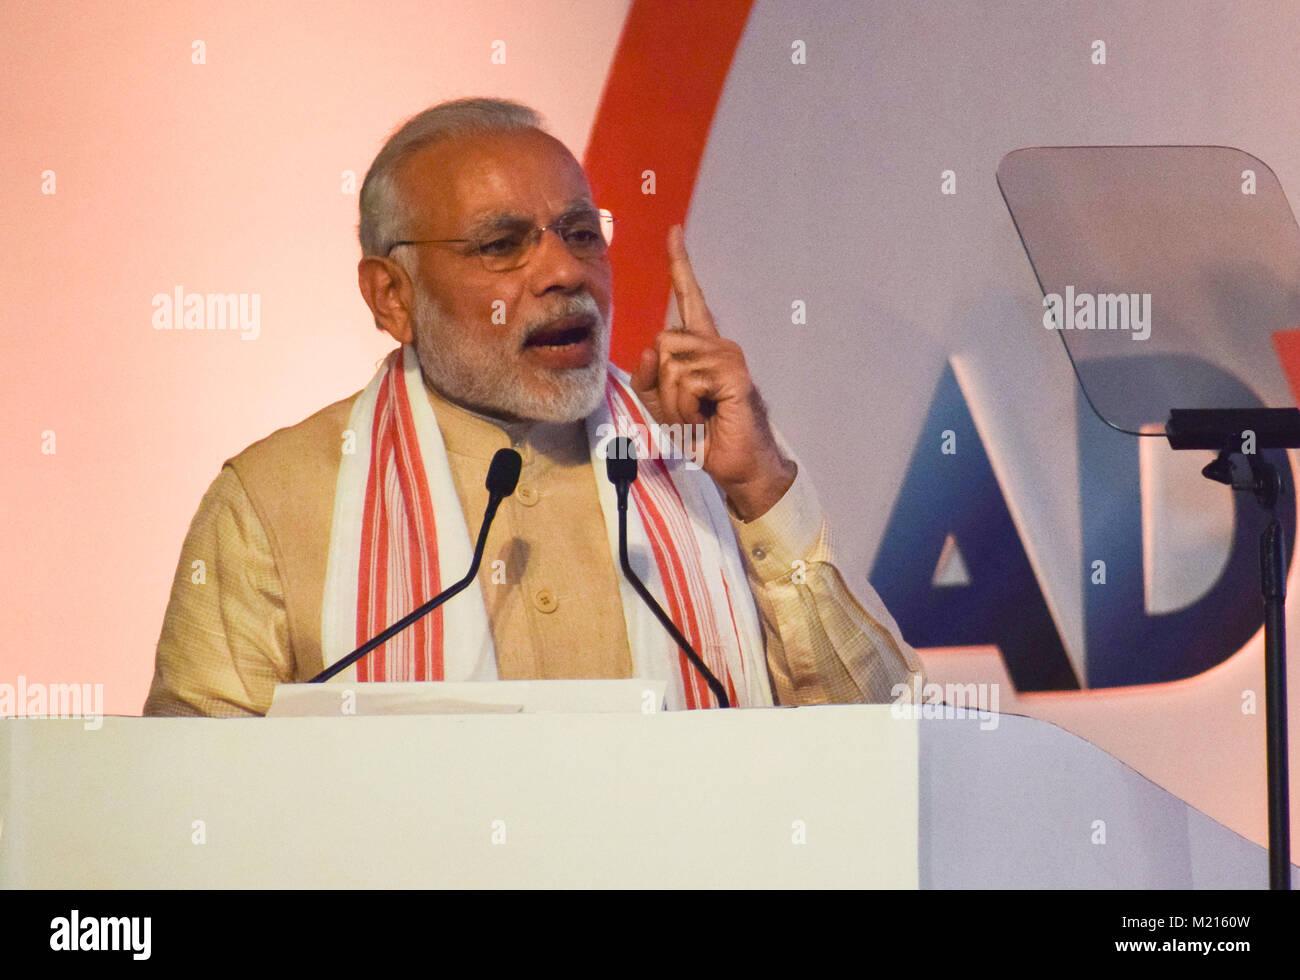 Prime Minister of India Narendra Modi addresses at Advantage Assam- Global Investors Summit 2018 at Sarusajai Stadium. - Stock Image